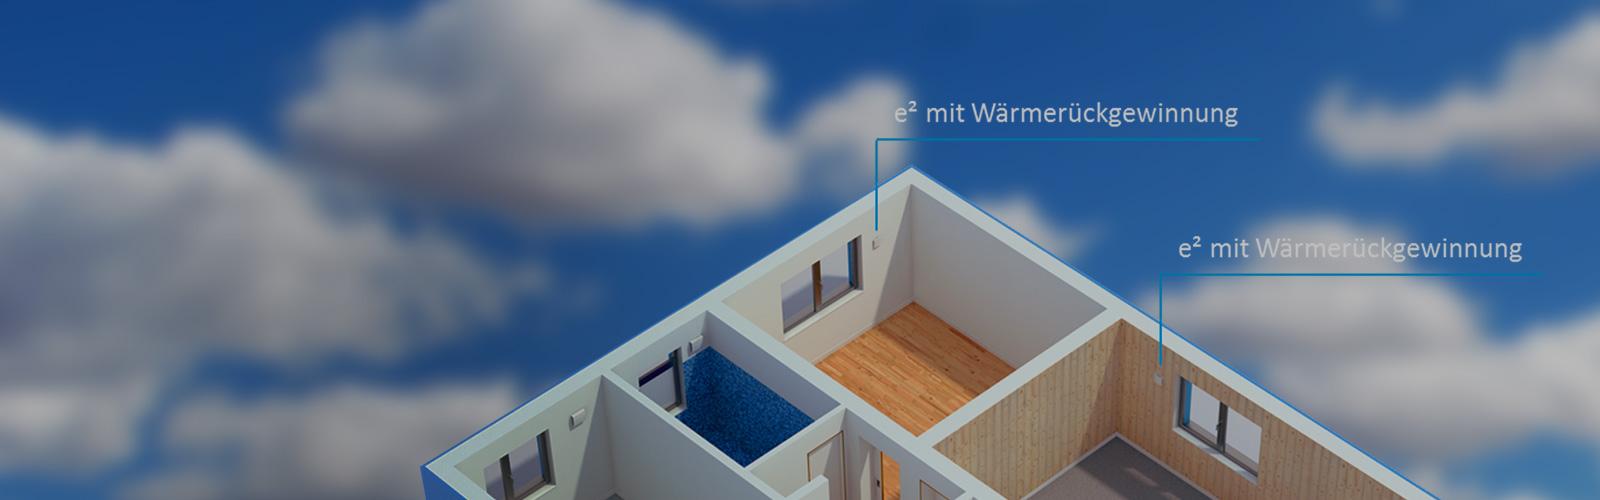 hitzler villenbach lueftung dezentrale 1600x500 hitzler heizung sanit r spenglerei l ftung. Black Bedroom Furniture Sets. Home Design Ideas